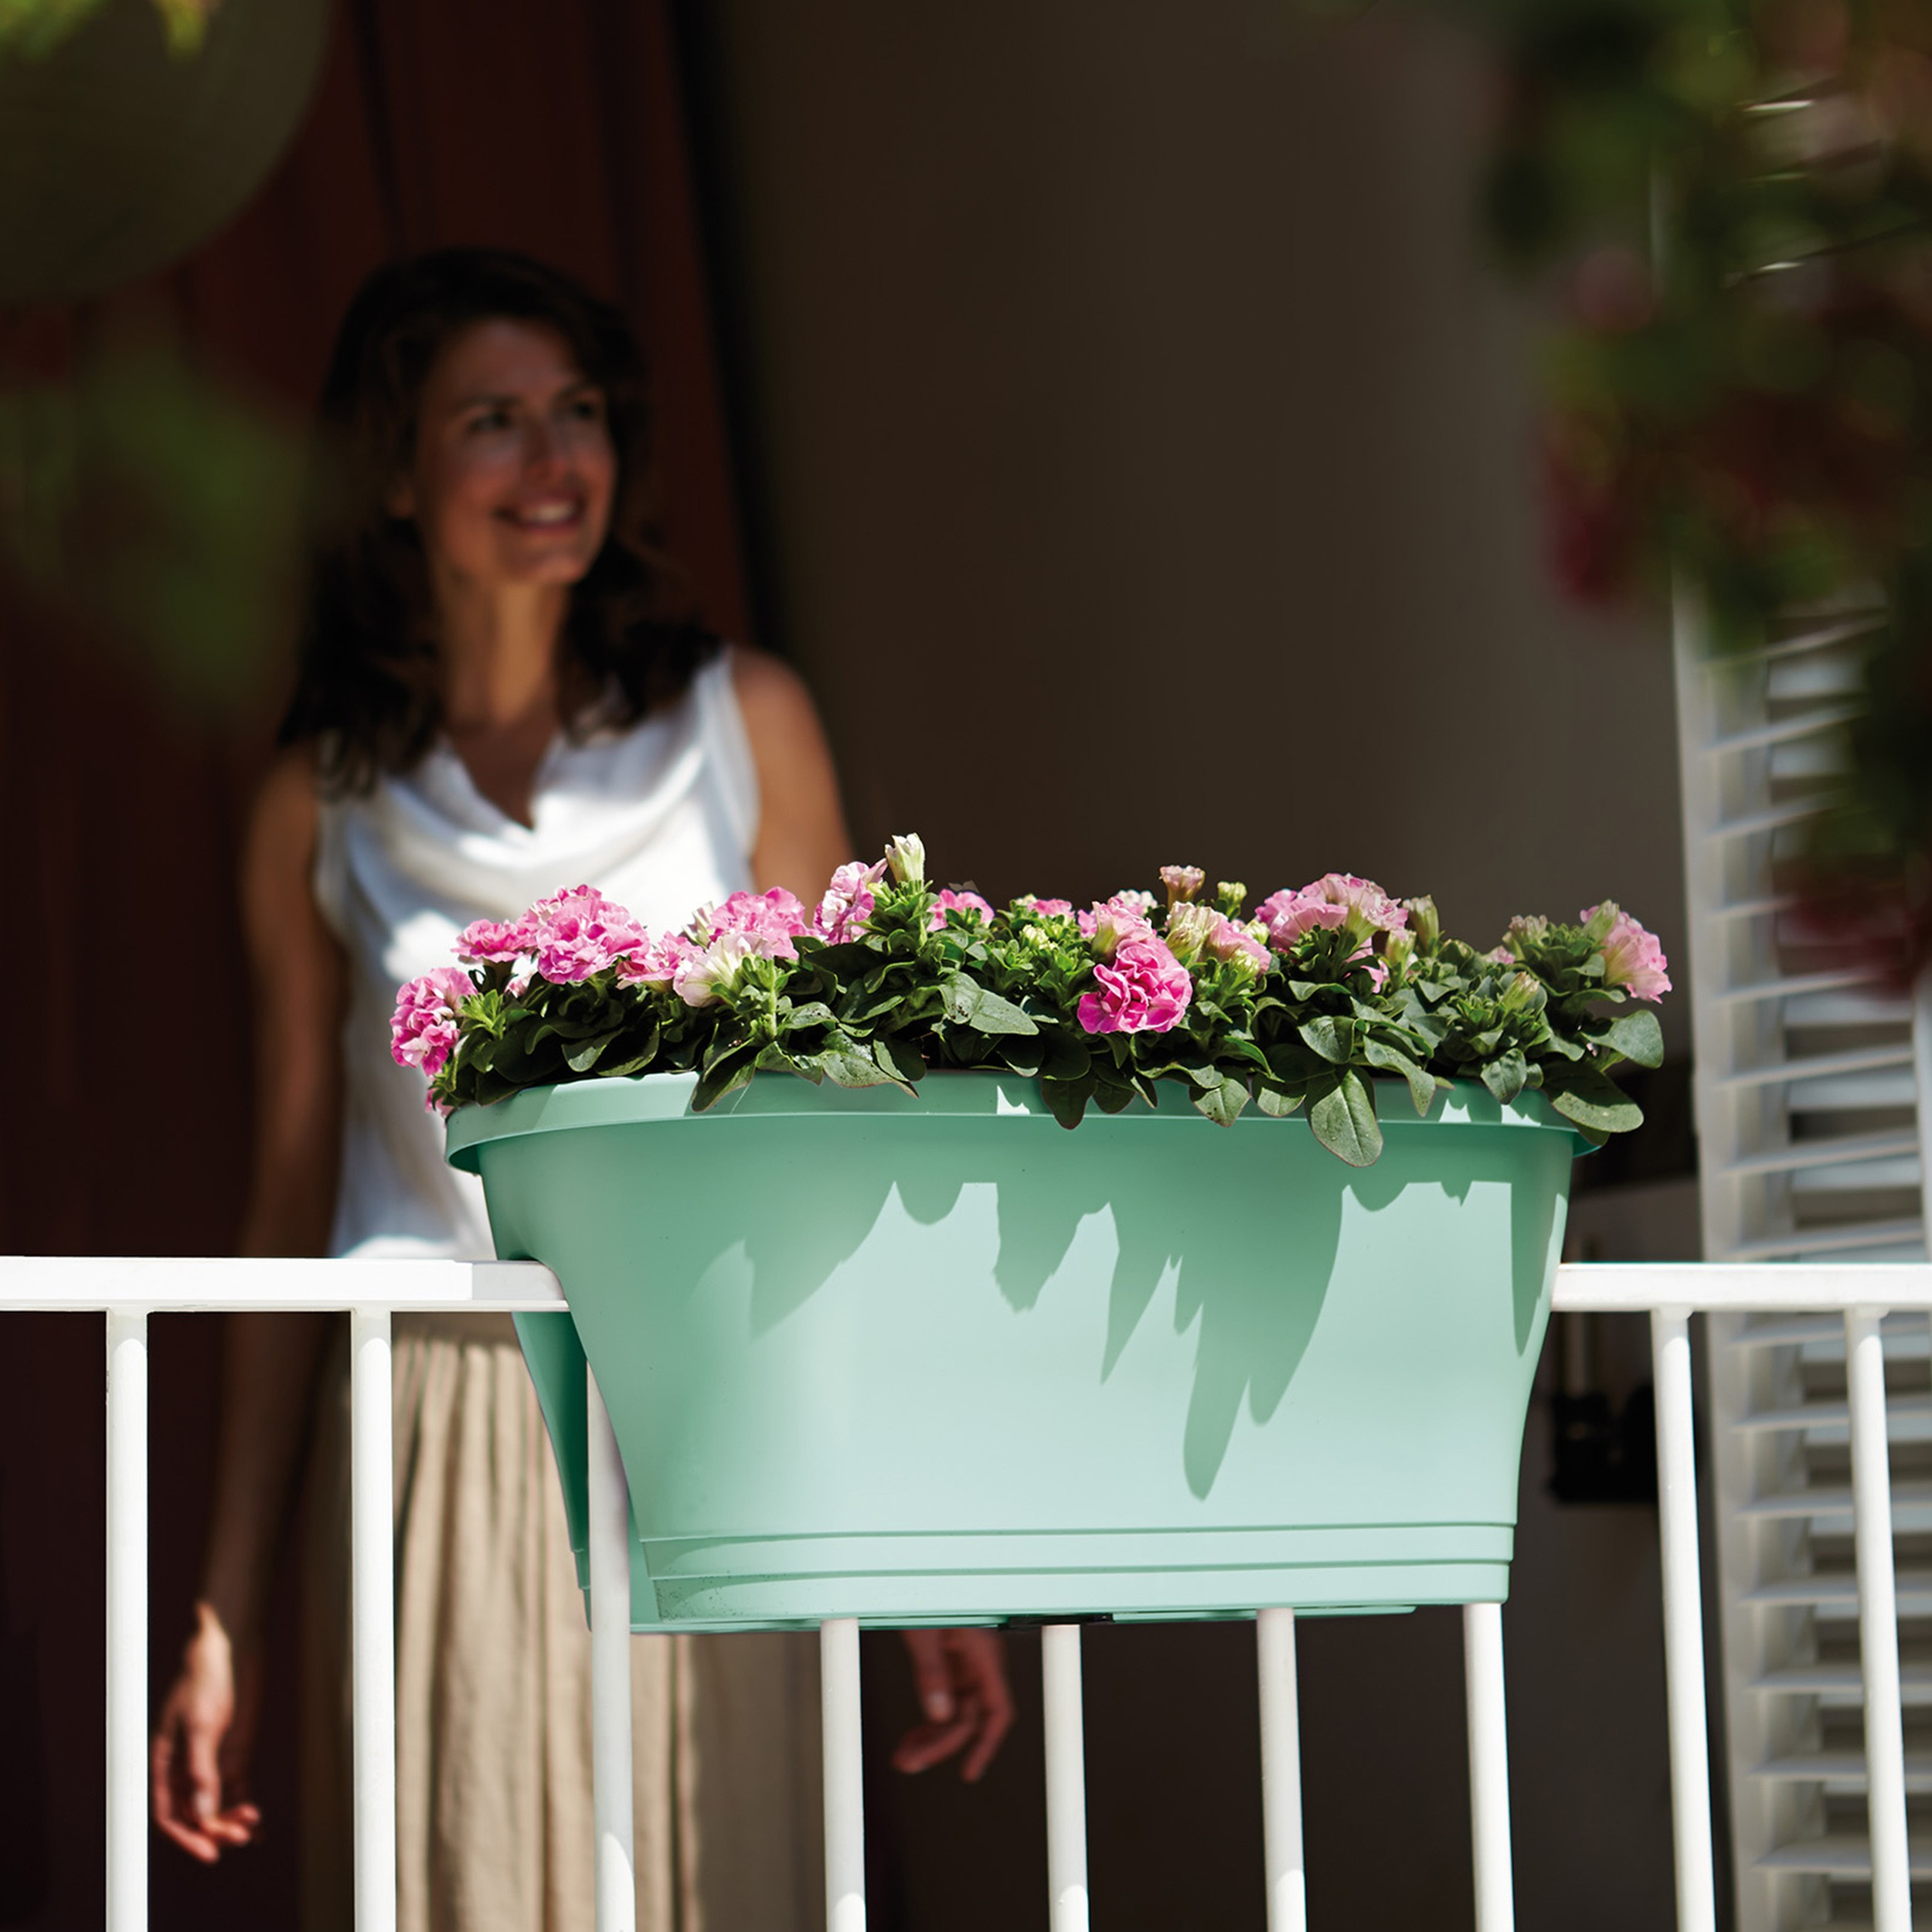 elho balkonkasten corsica flower bridge 60cm blumentopf. Black Bedroom Furniture Sets. Home Design Ideas